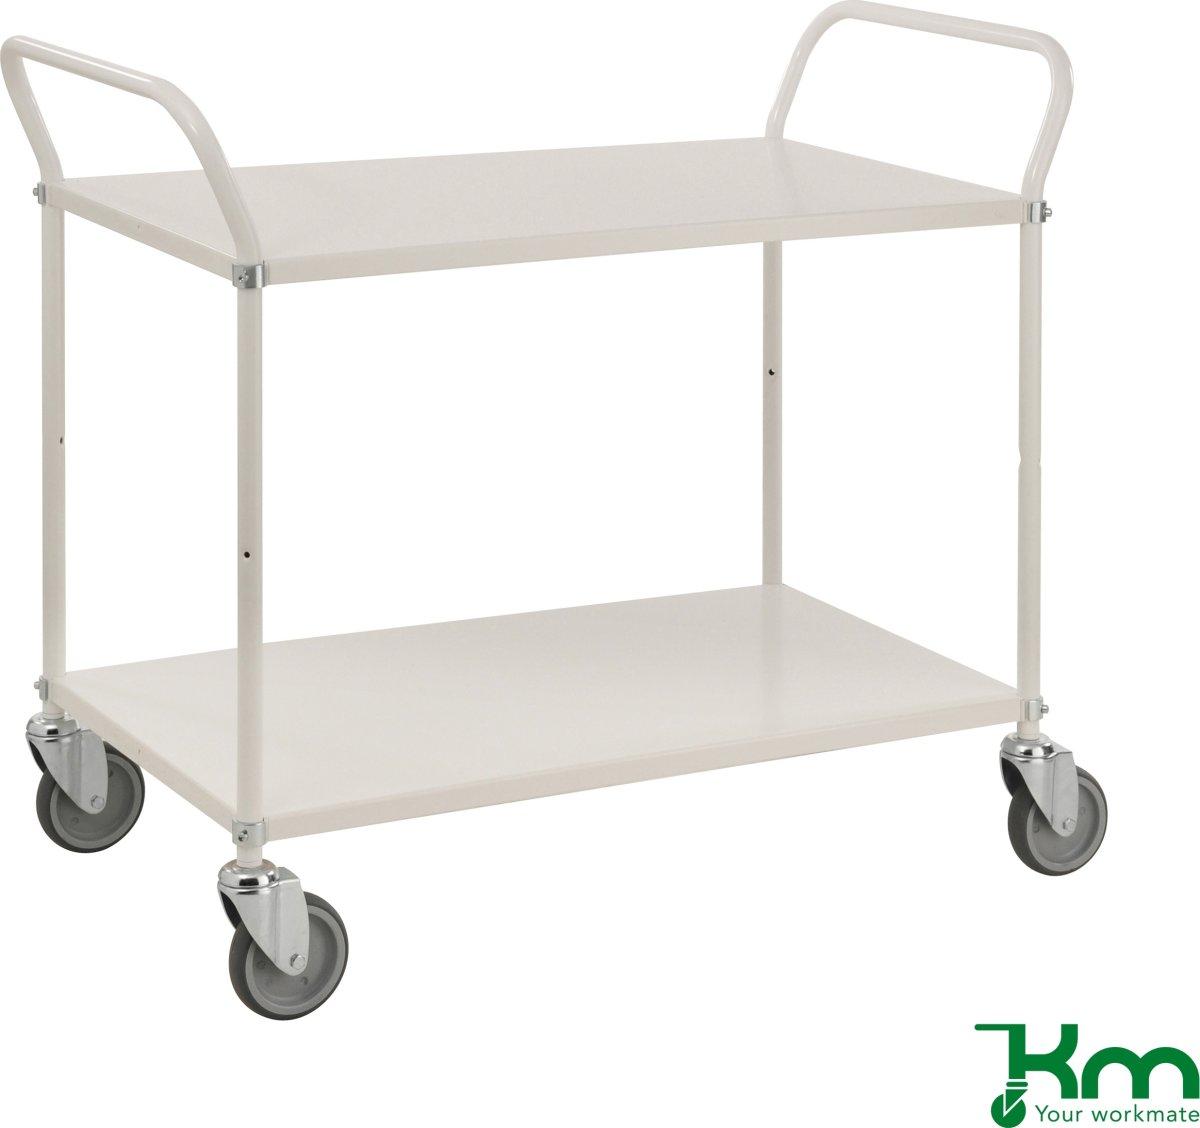 Rullebord 2 hylder, 1070x585x940 mm, 250kg, hvid